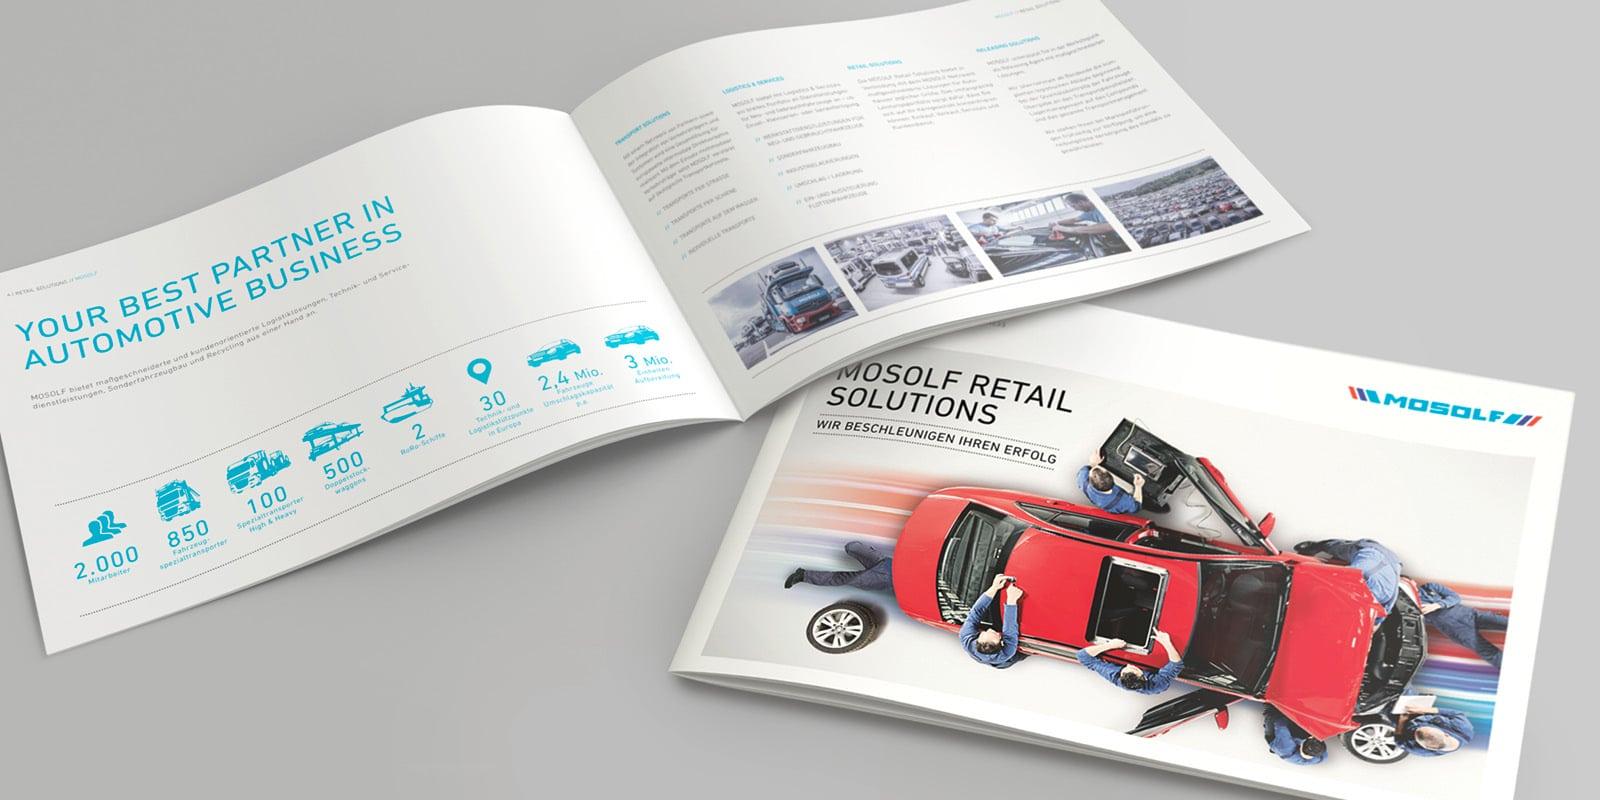 Mosolf – Retail Solutions Broschüre